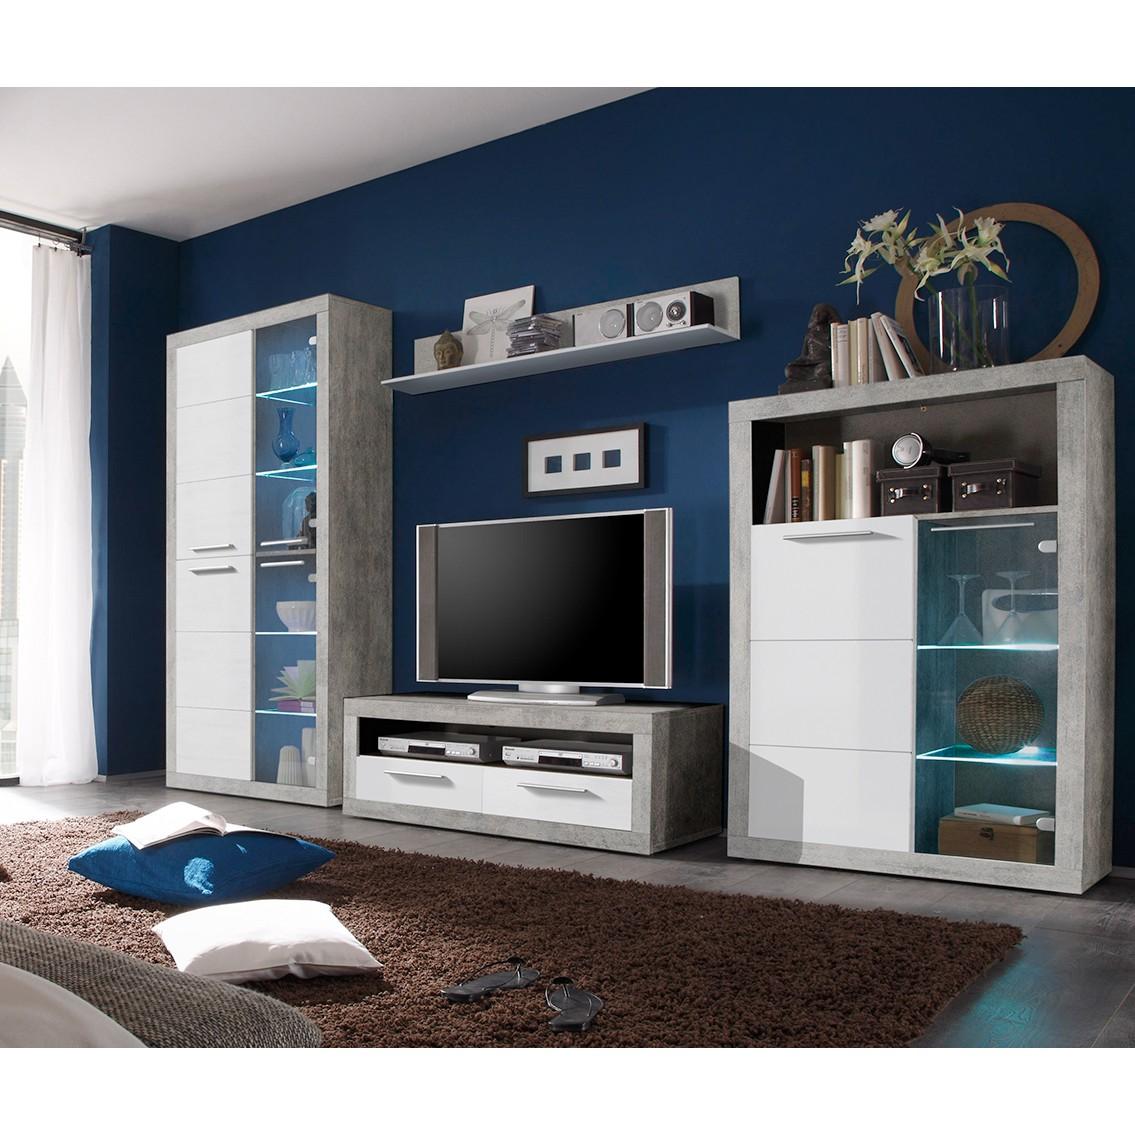 EEK A+, Ensemble de meubles TV Rognan I (4 éléments) - Avec éclairage - Blanc / Imitation béton, Fre